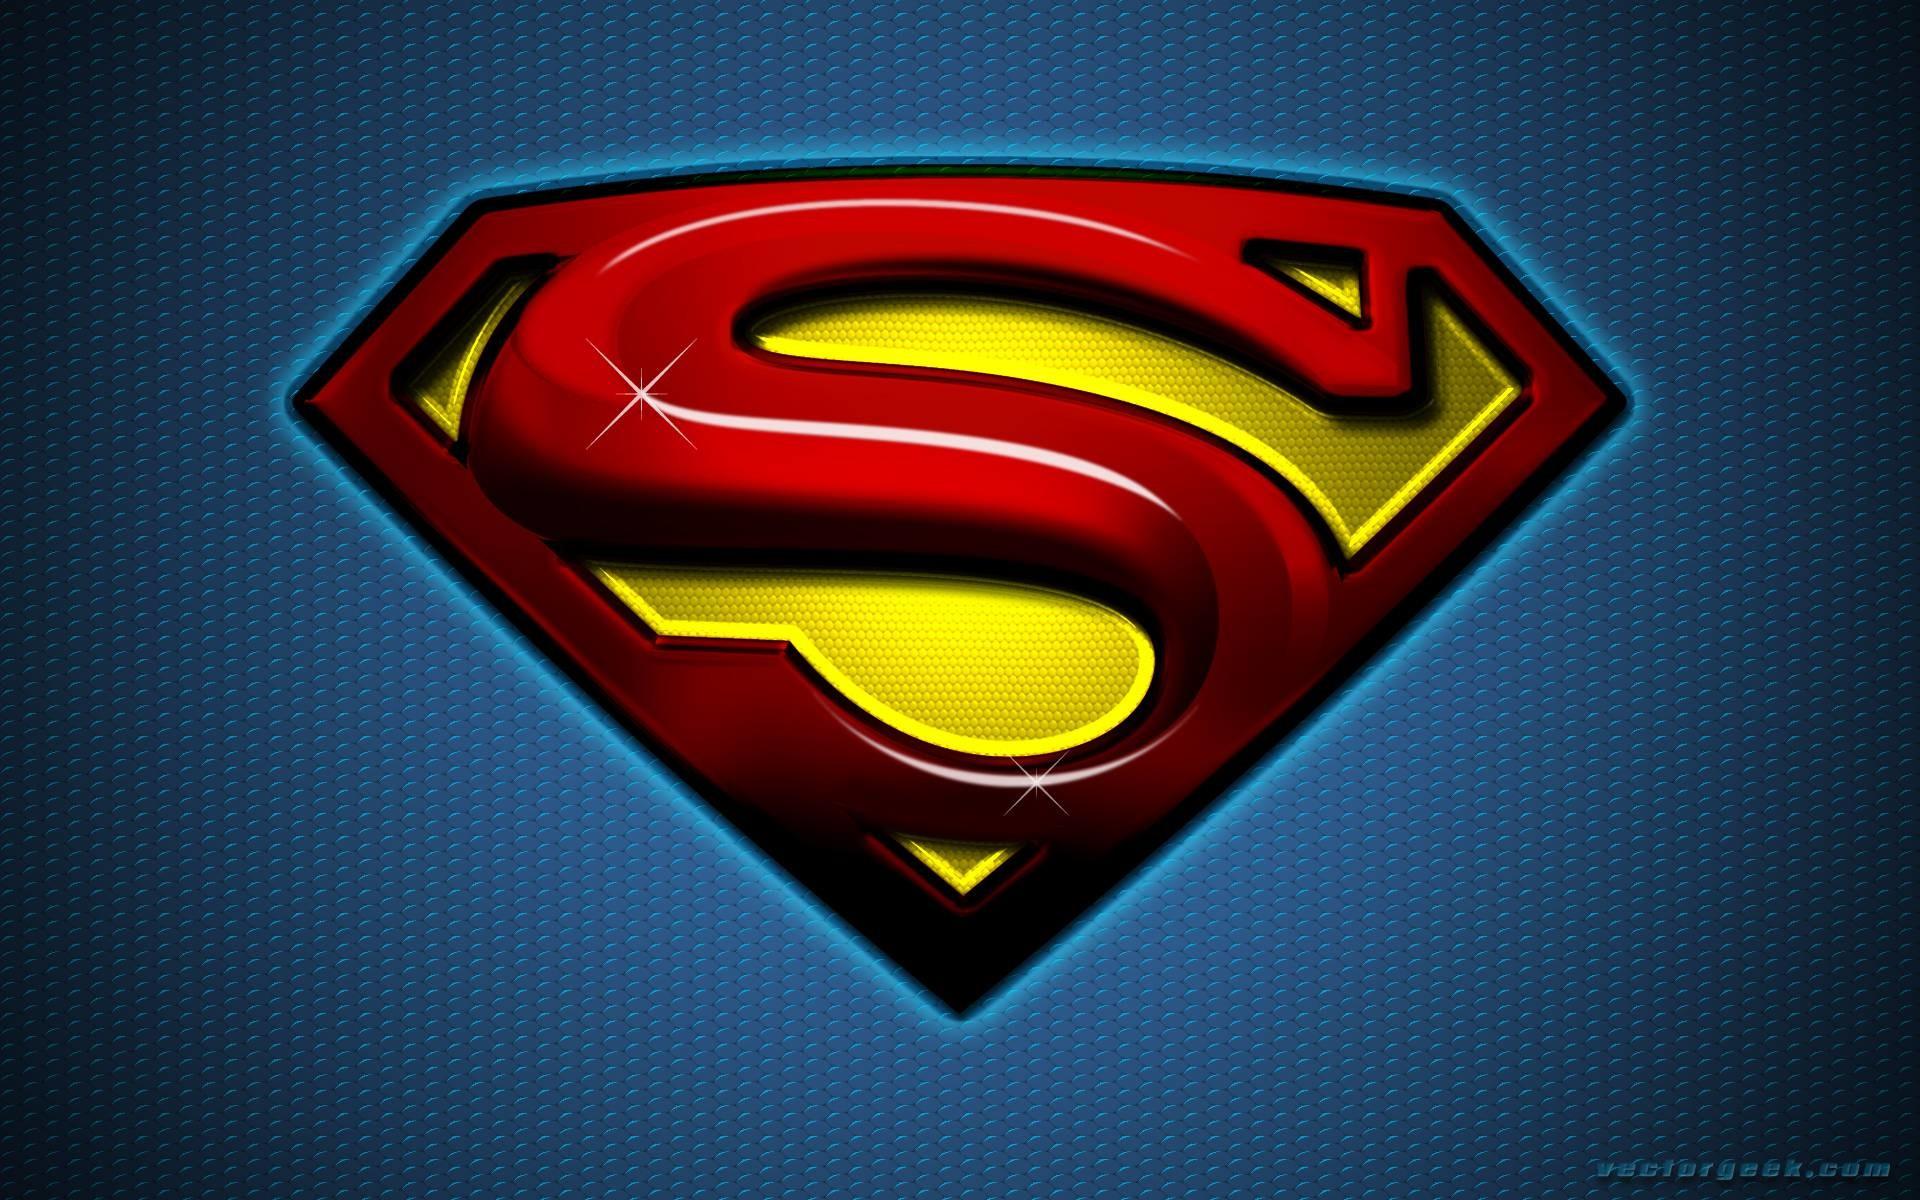 Superman Logo Wallpapers – Full HD wallpaper search